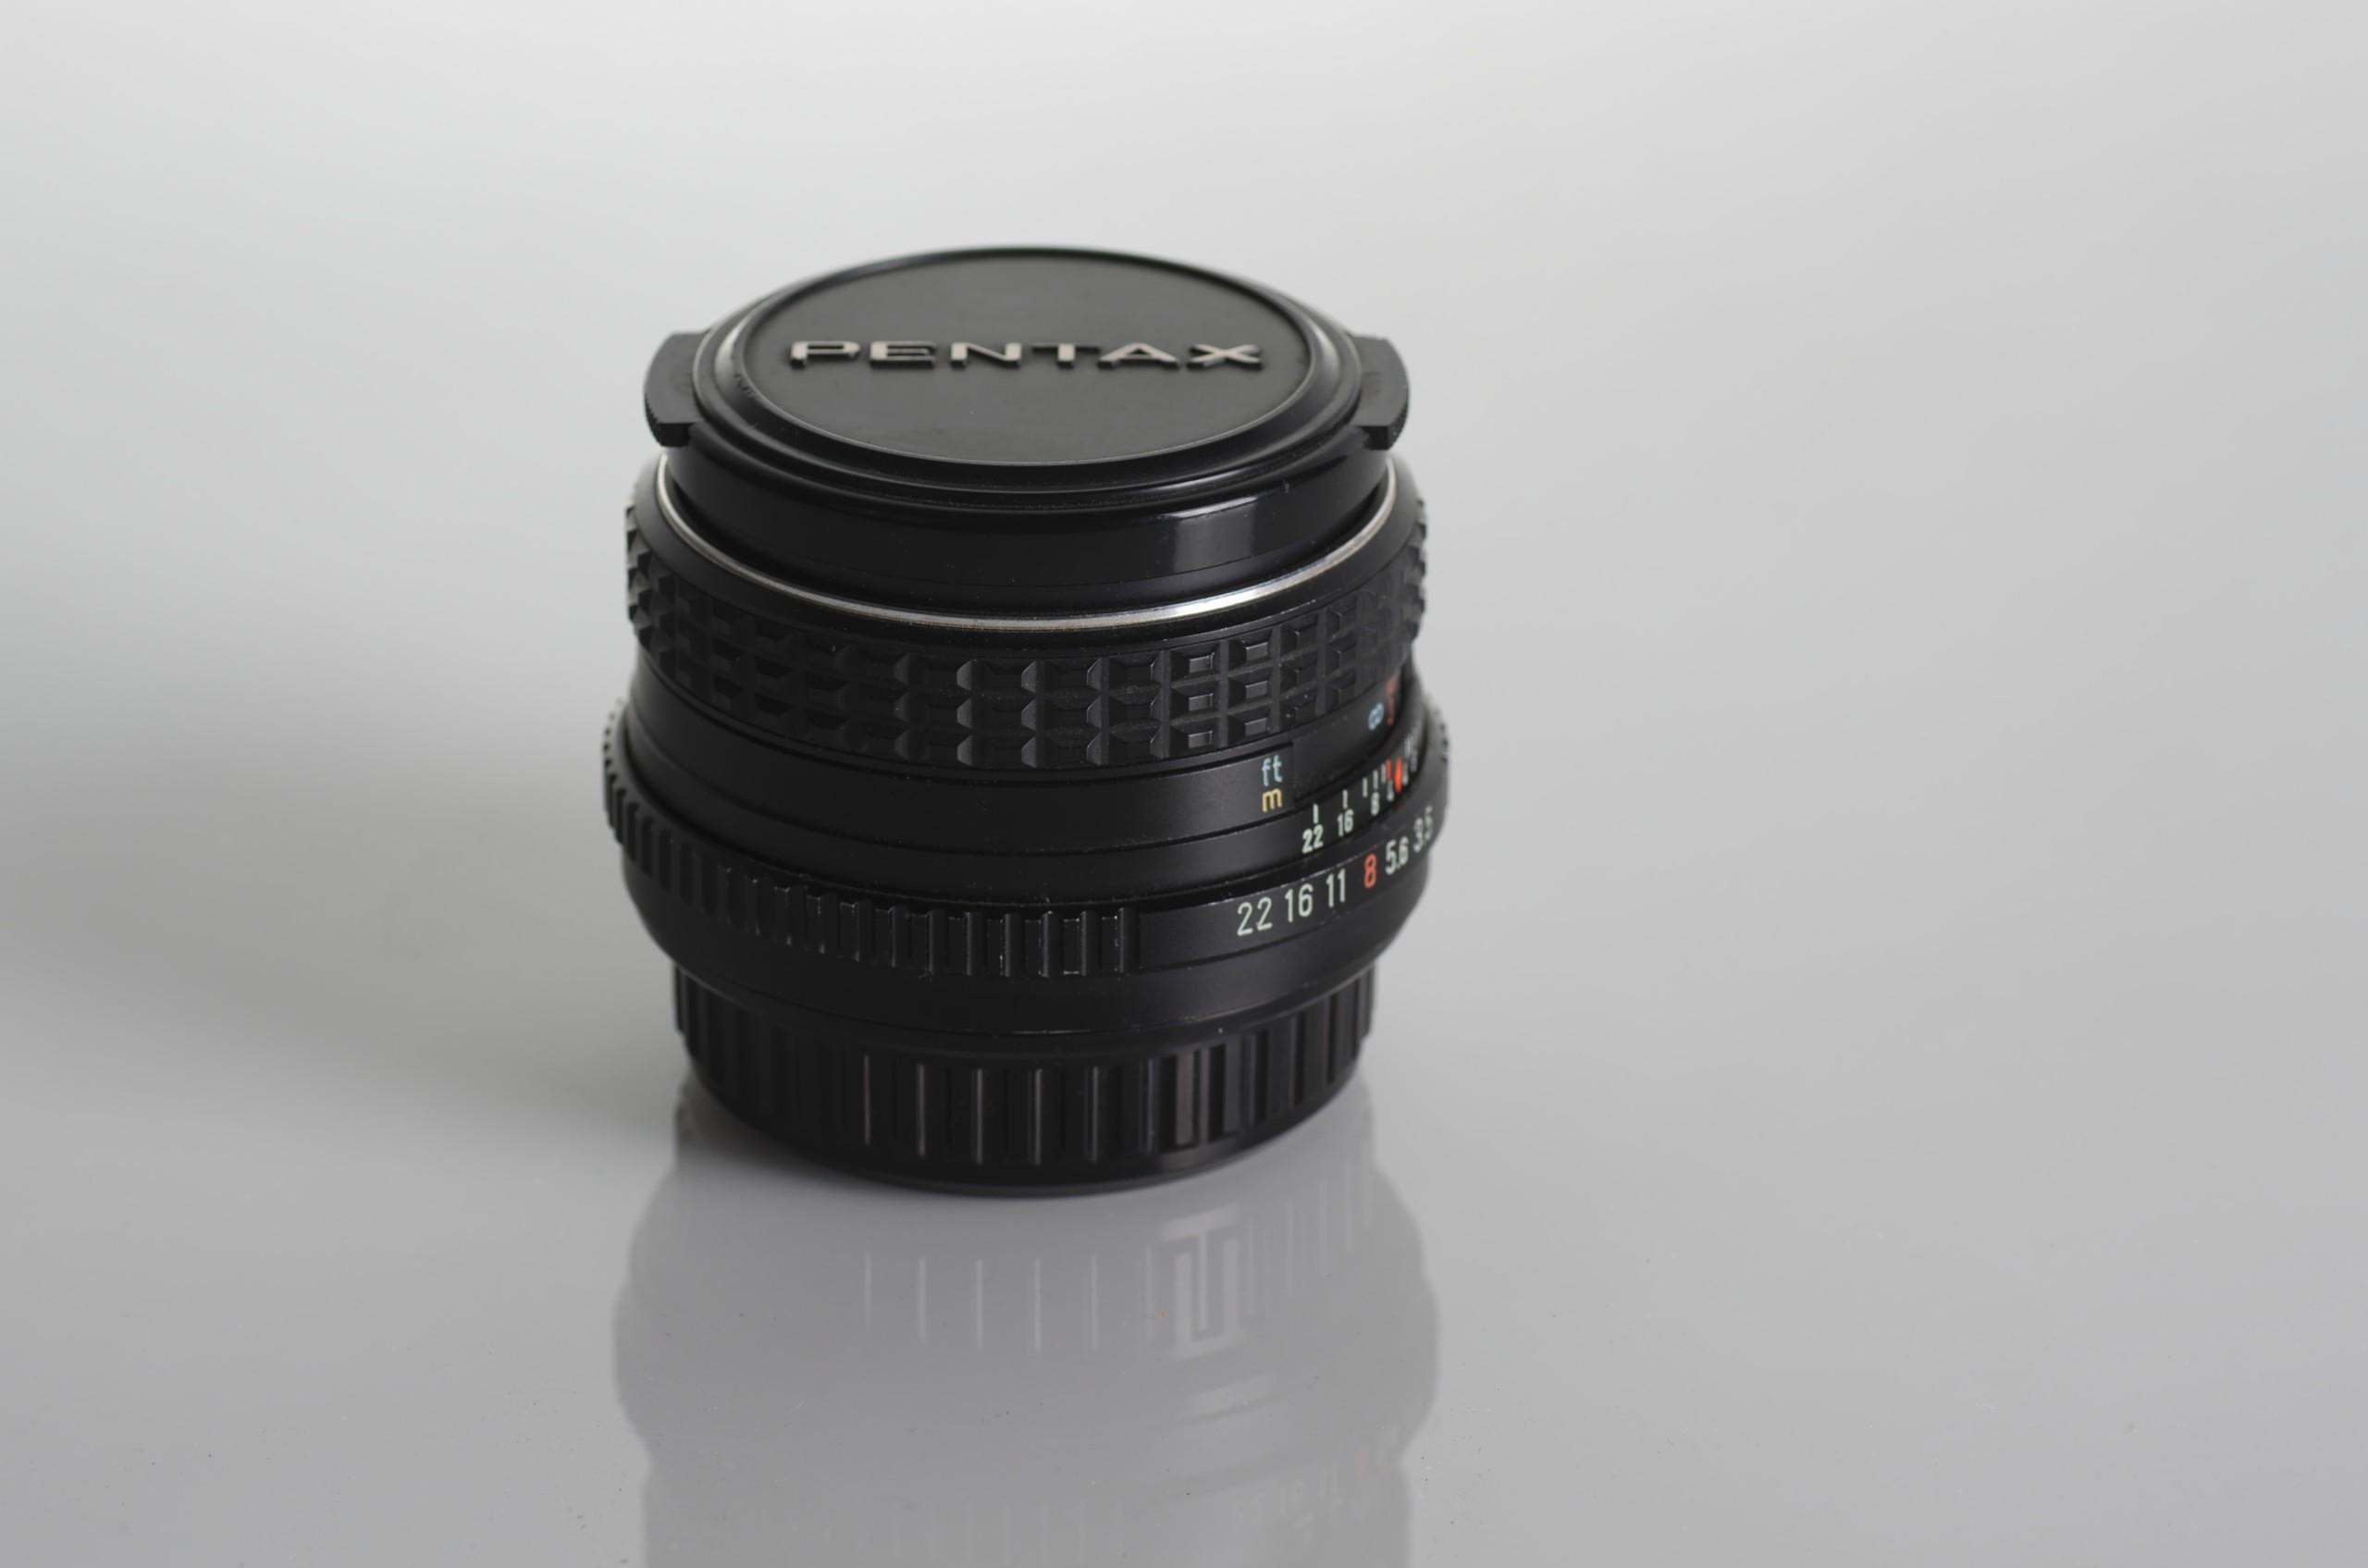 Pentax M 28 3.5